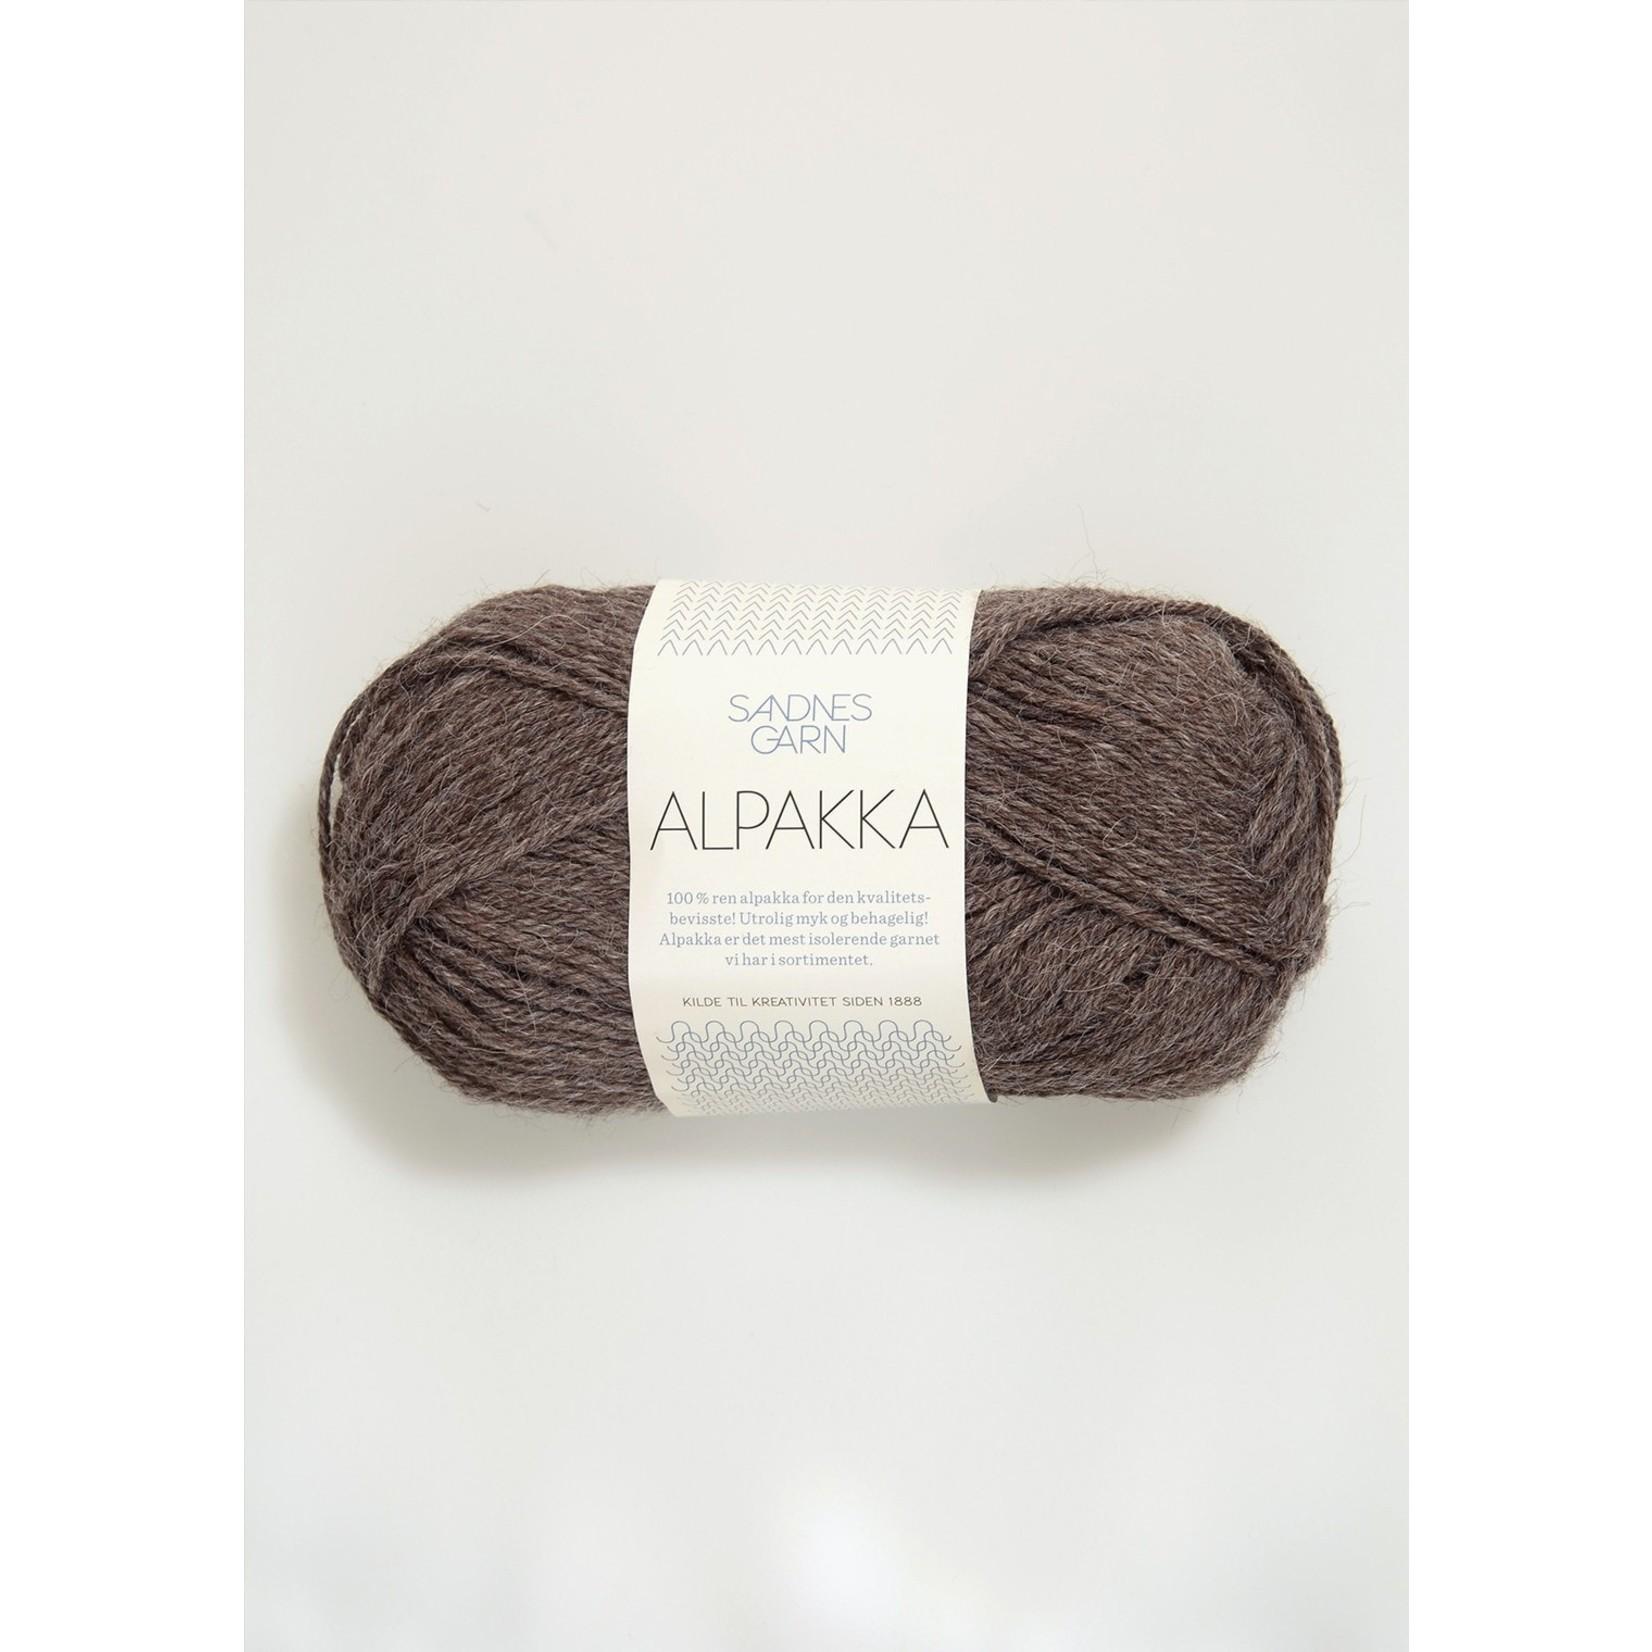 Sandnes Garn Alpakka, 2652, Med Brown Heather